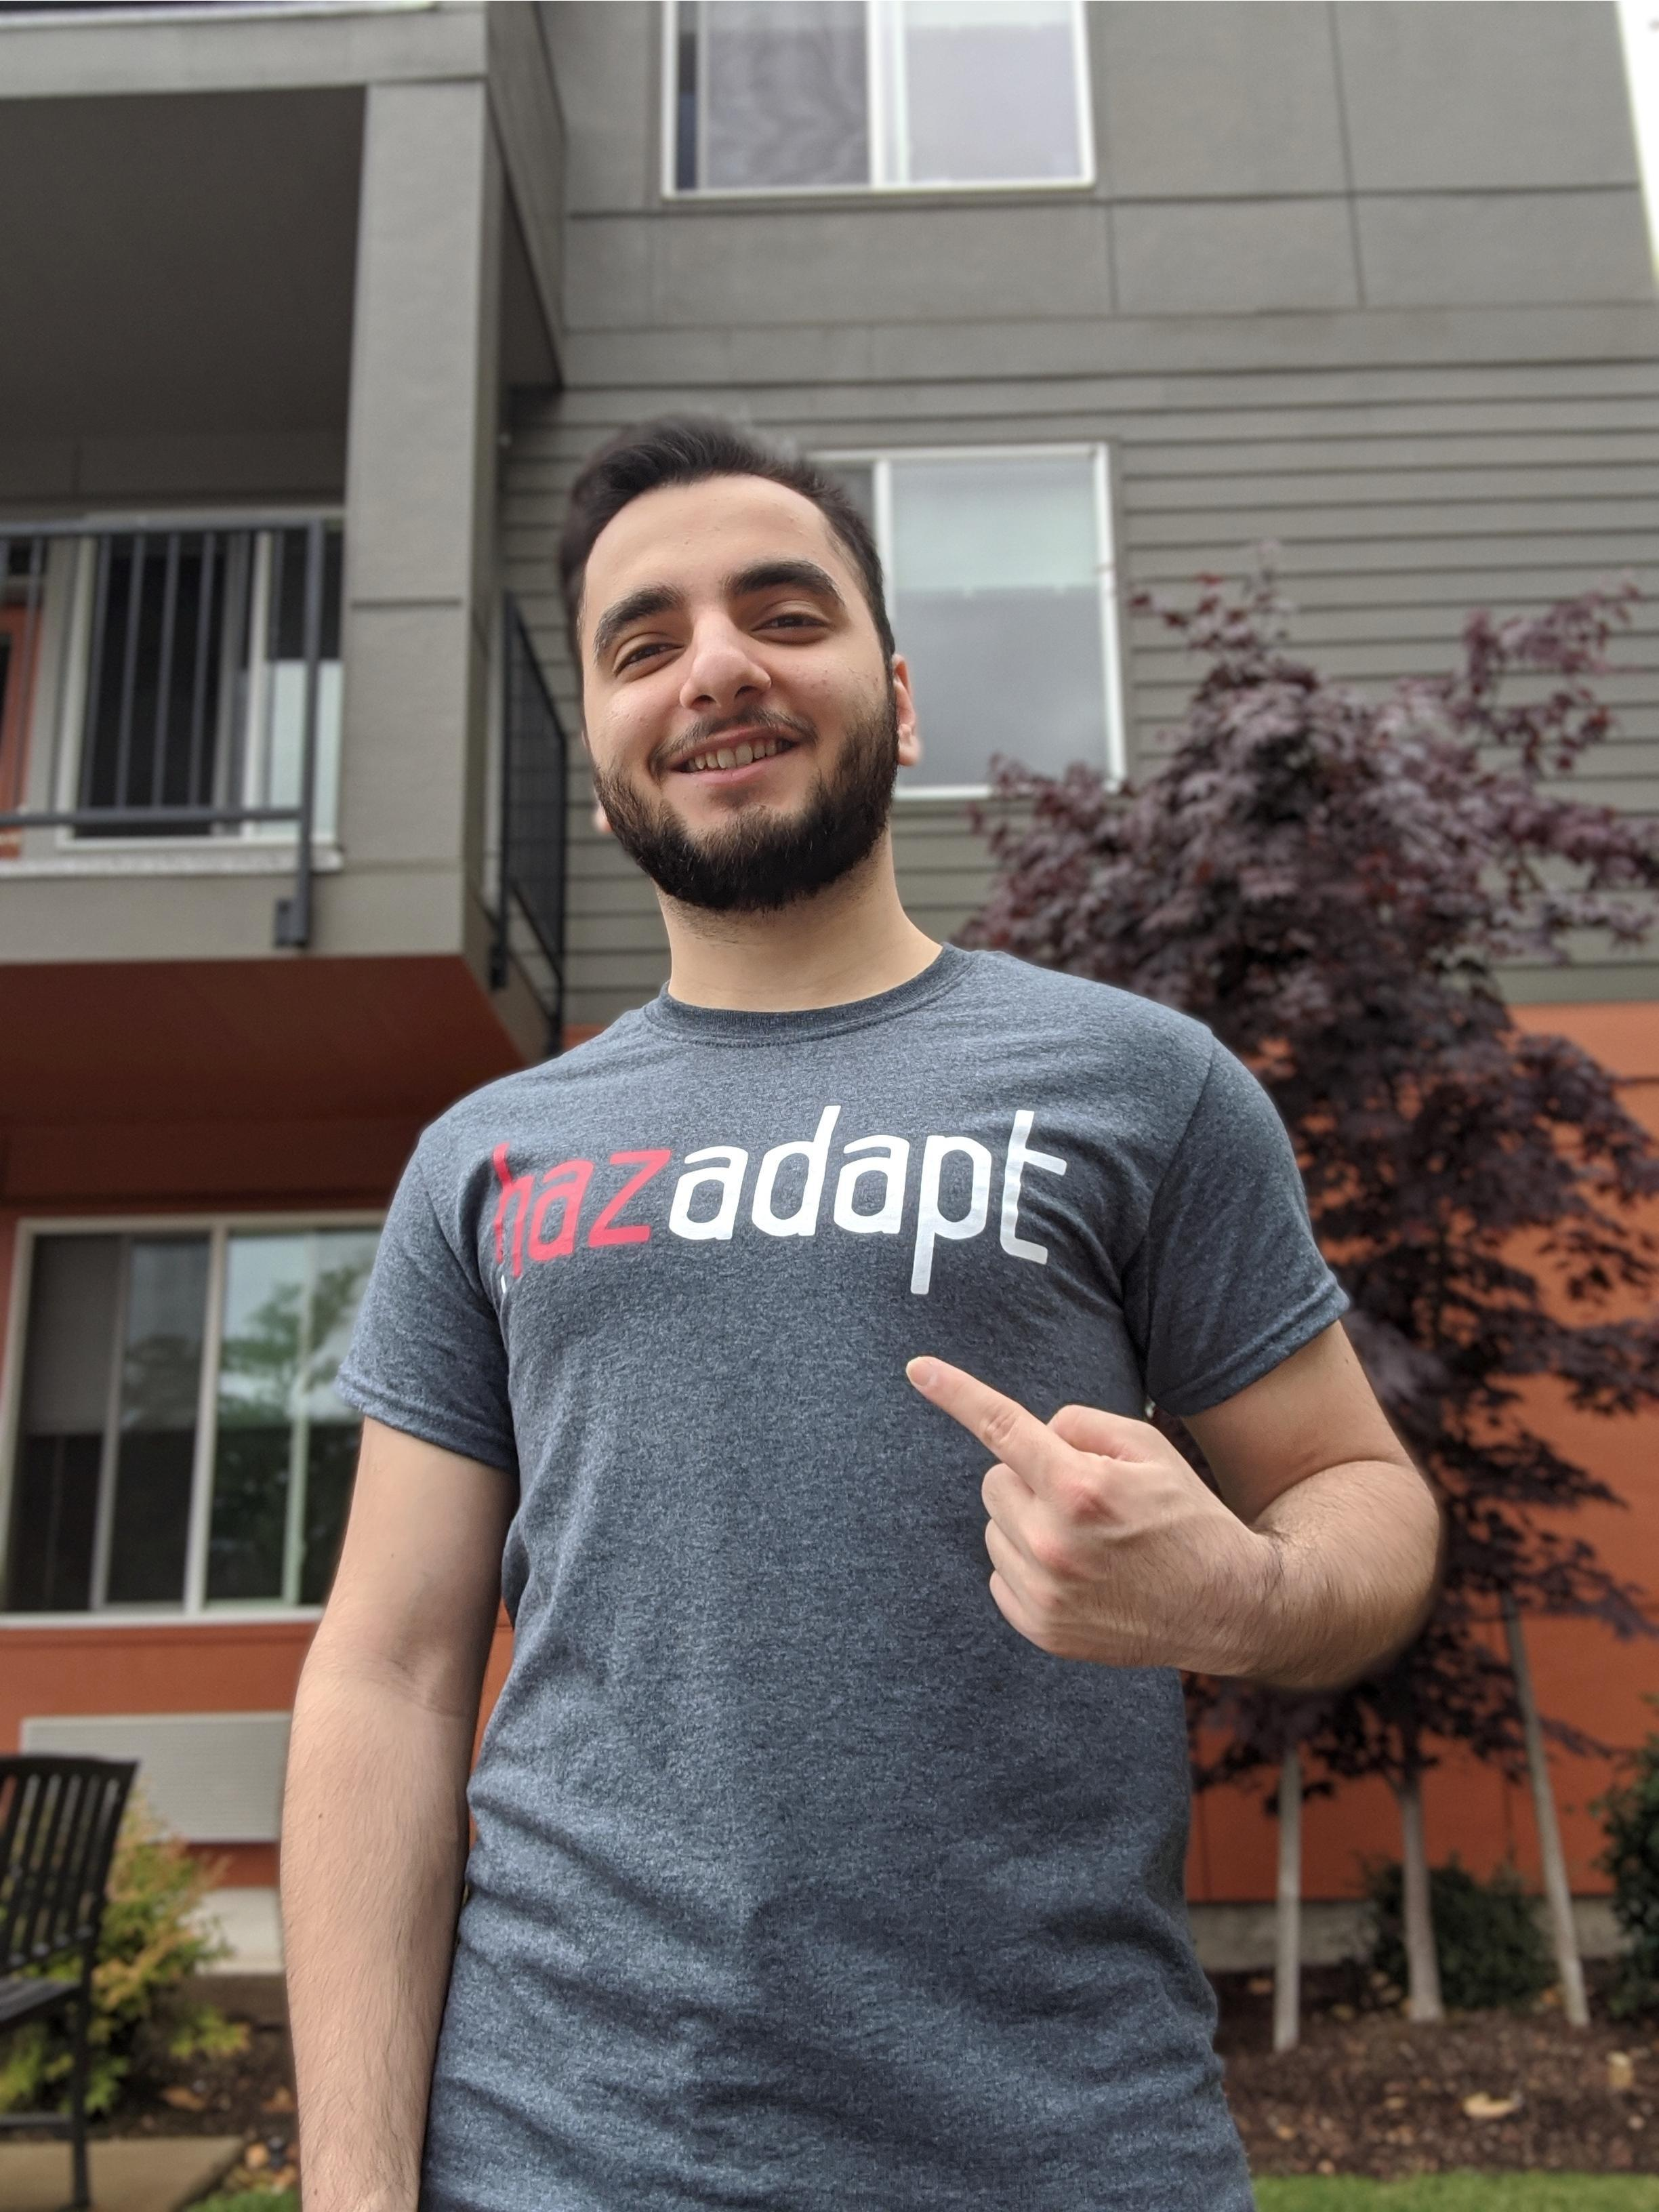 A HazAdapt team member pointing to his HazAdapt t-shirt.